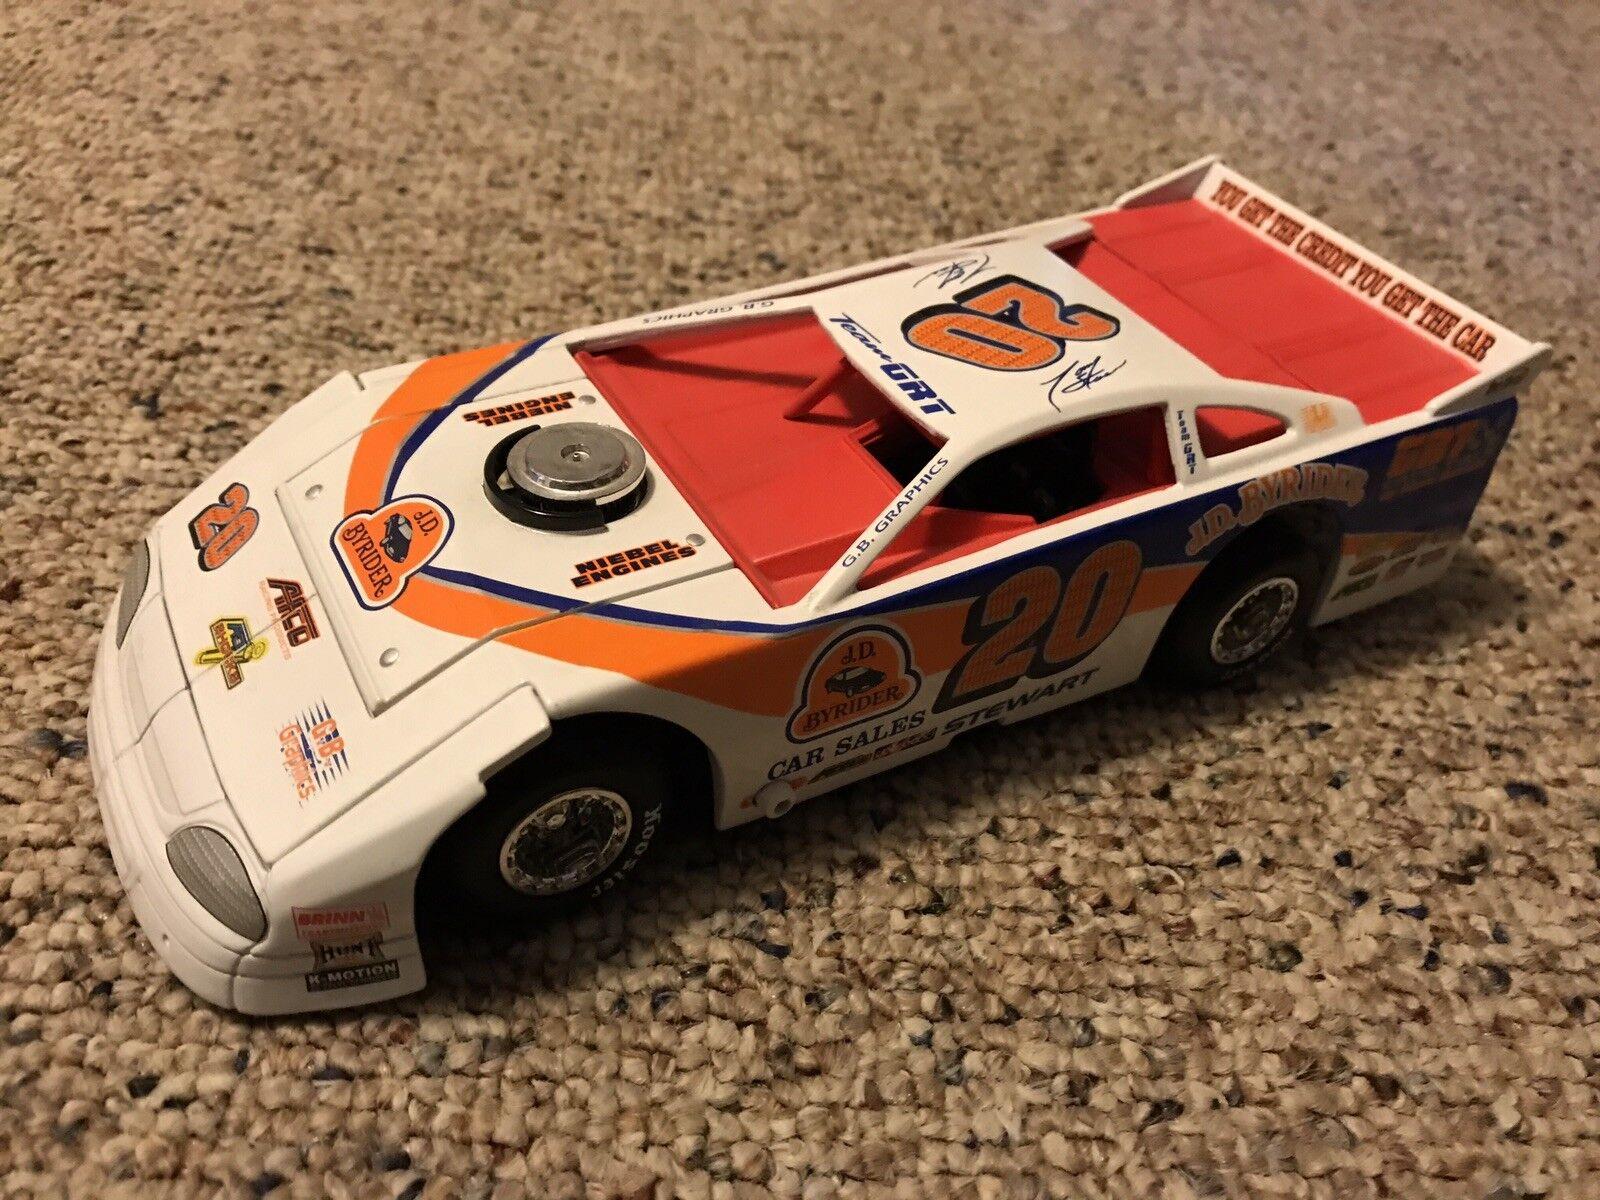 ACTION RACING 2000 Tony Stewart 1 24  20 JD byrider Dirt voiture 1 de 9000